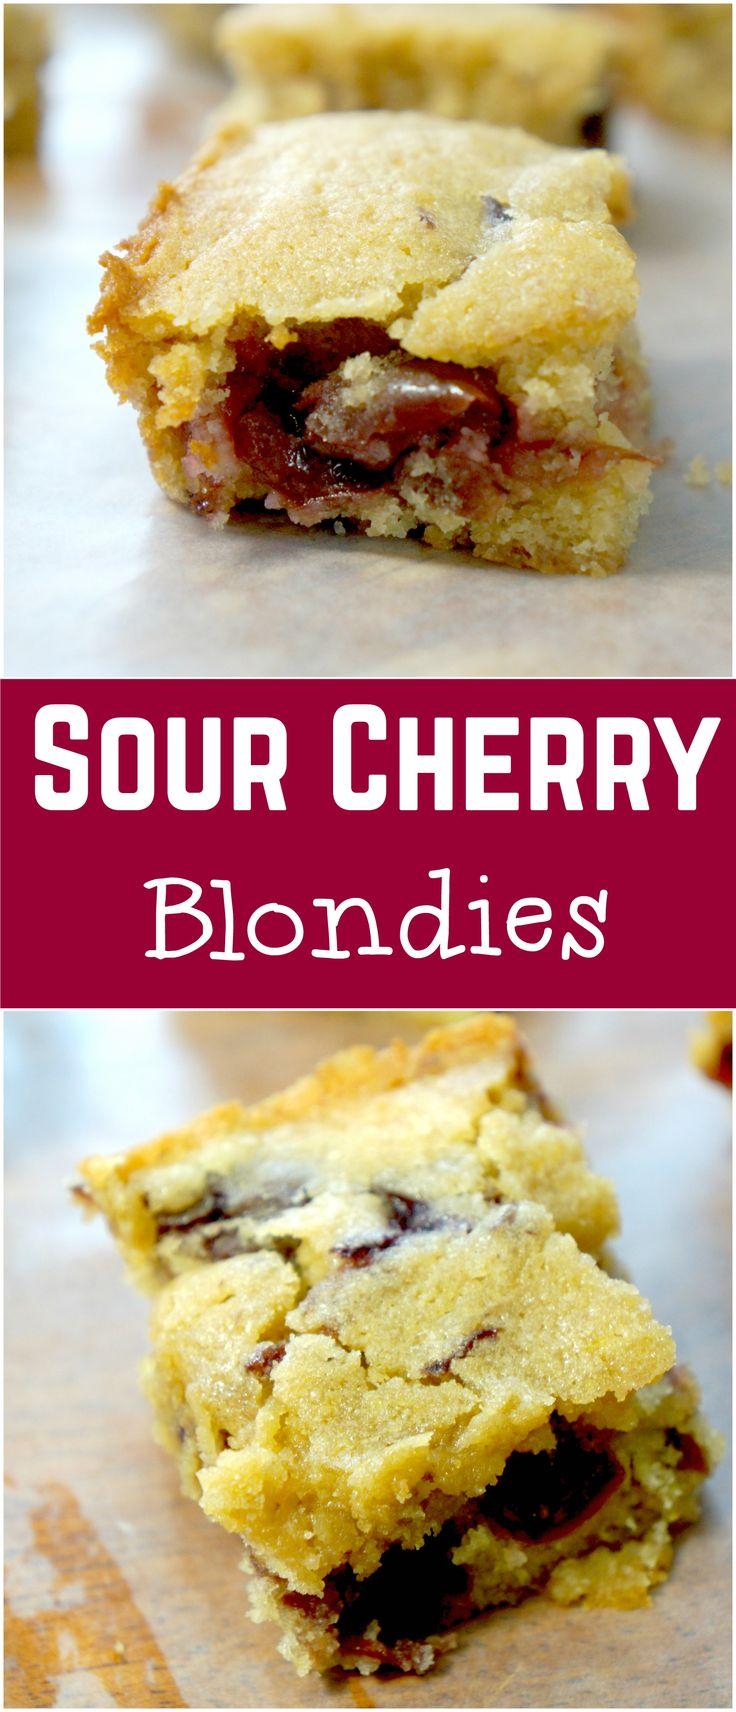 Blondie recipe.